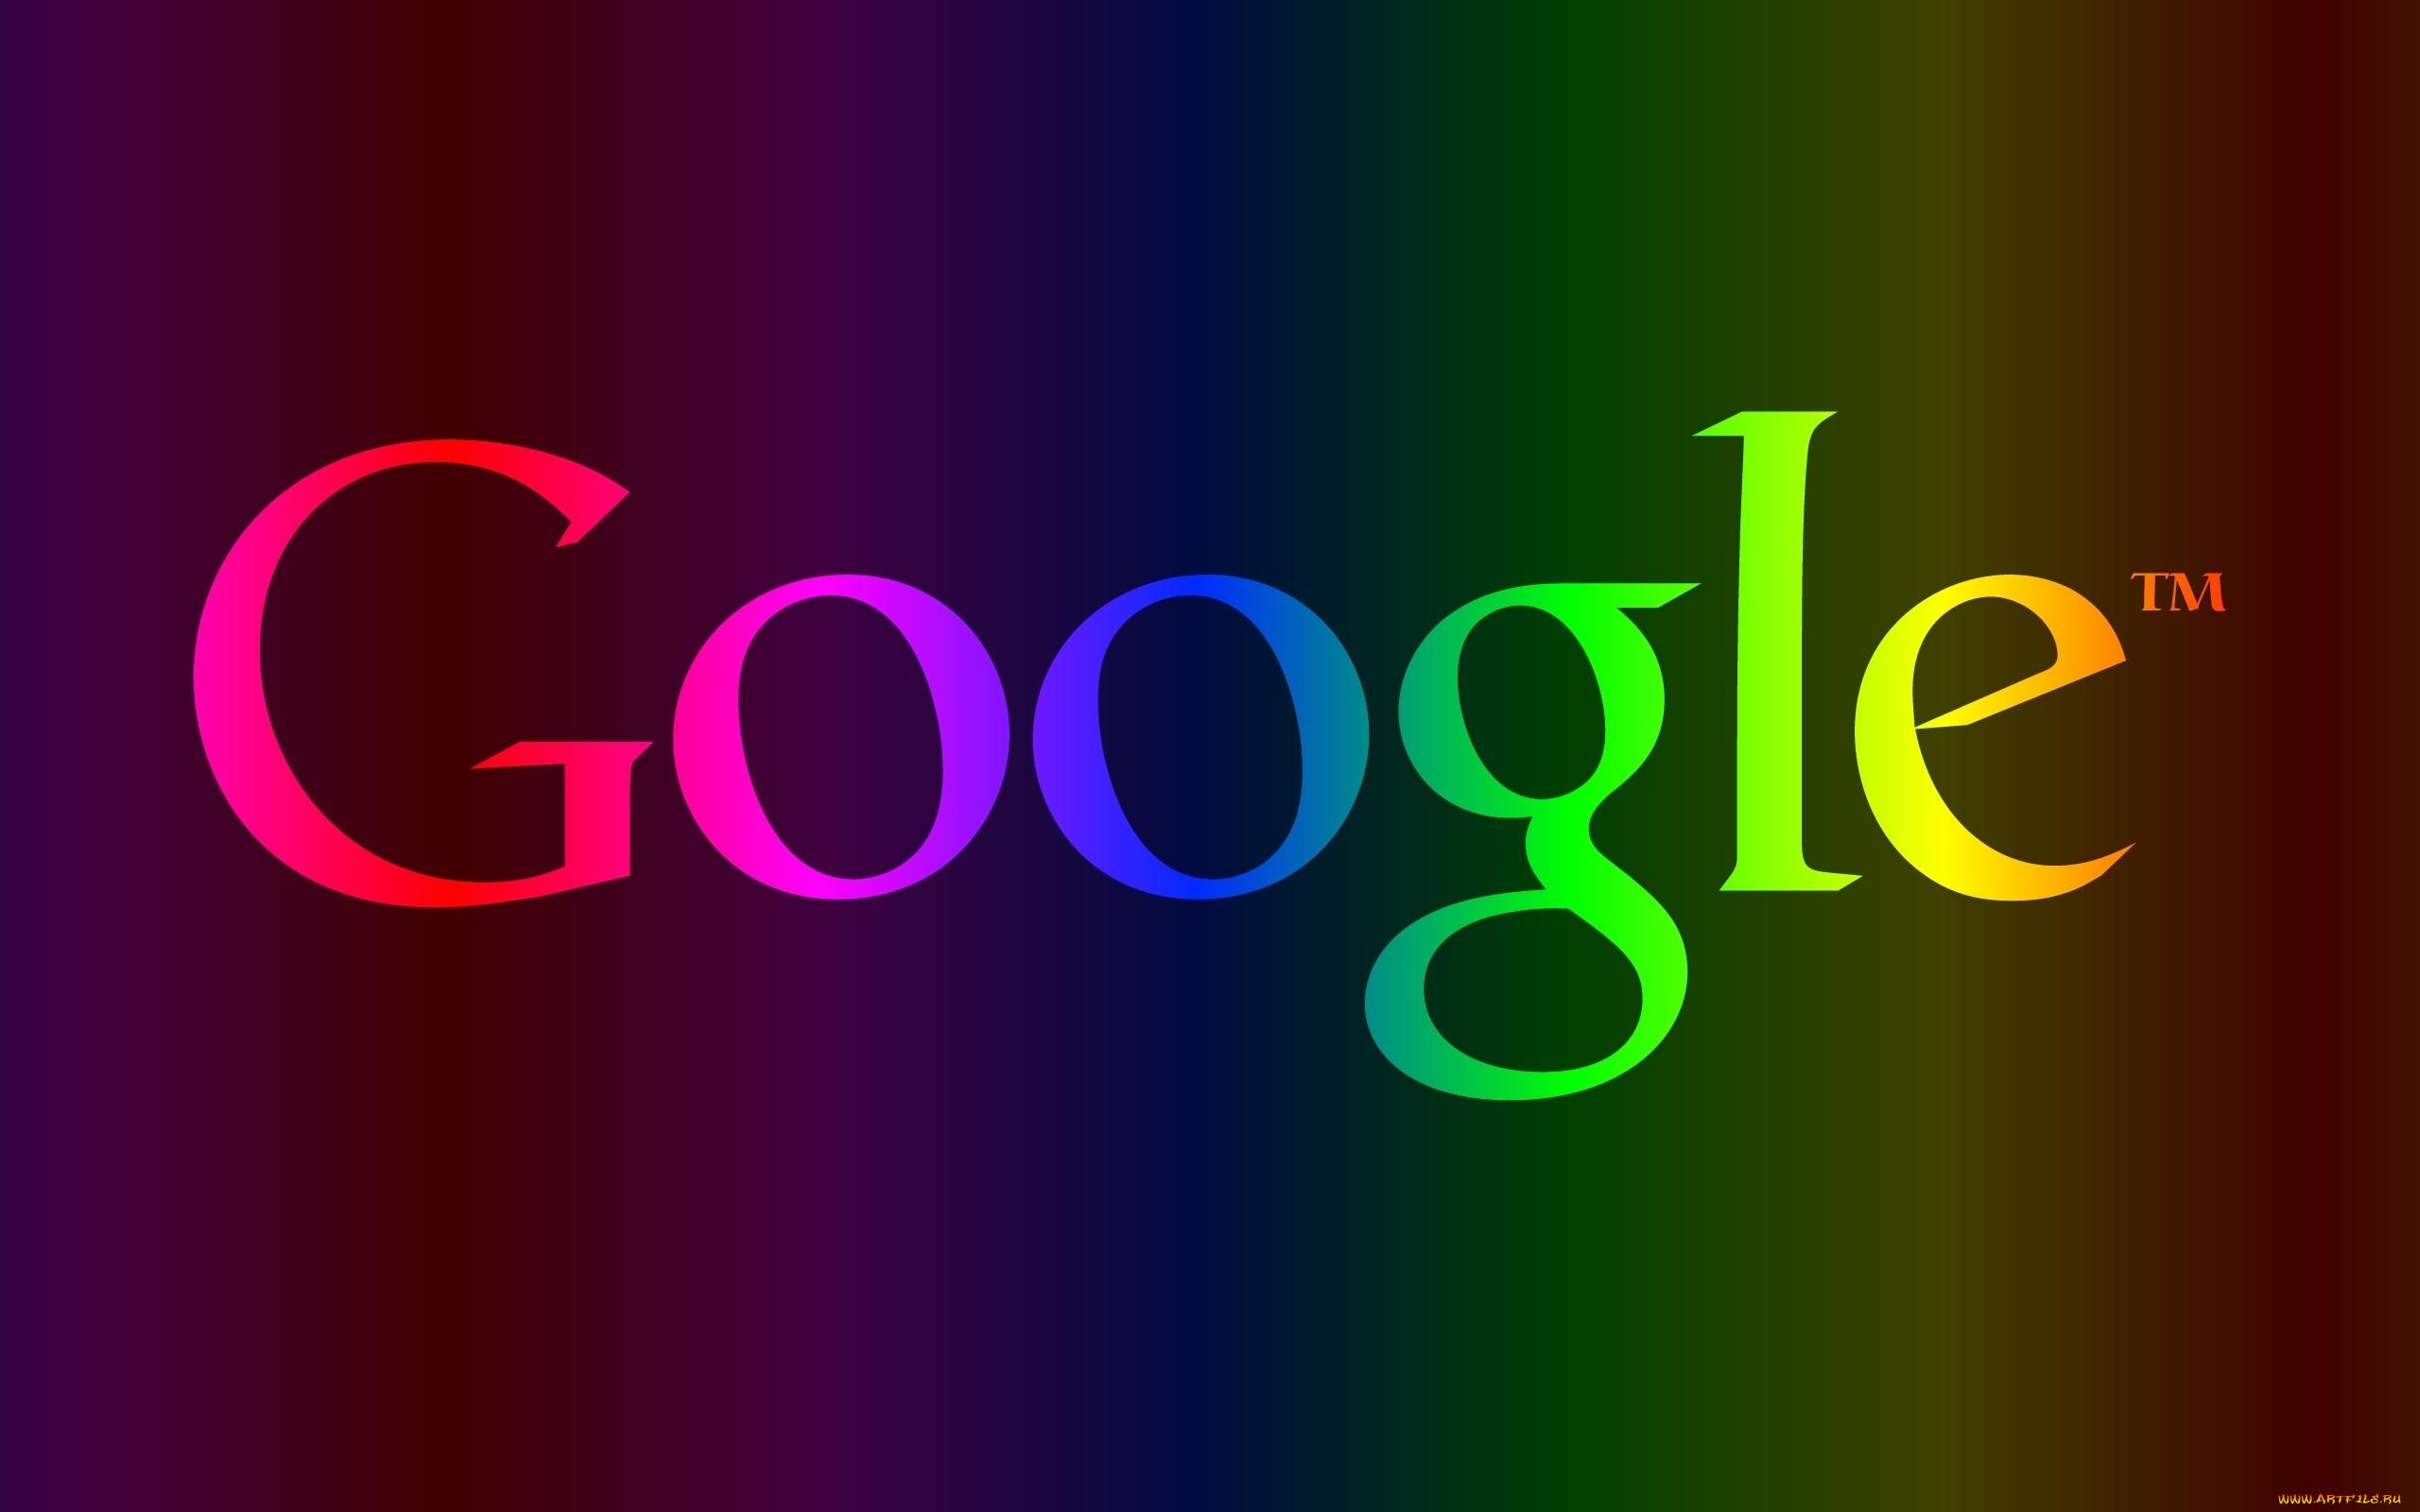 шаговой доступности логотипы гугл картинки нива